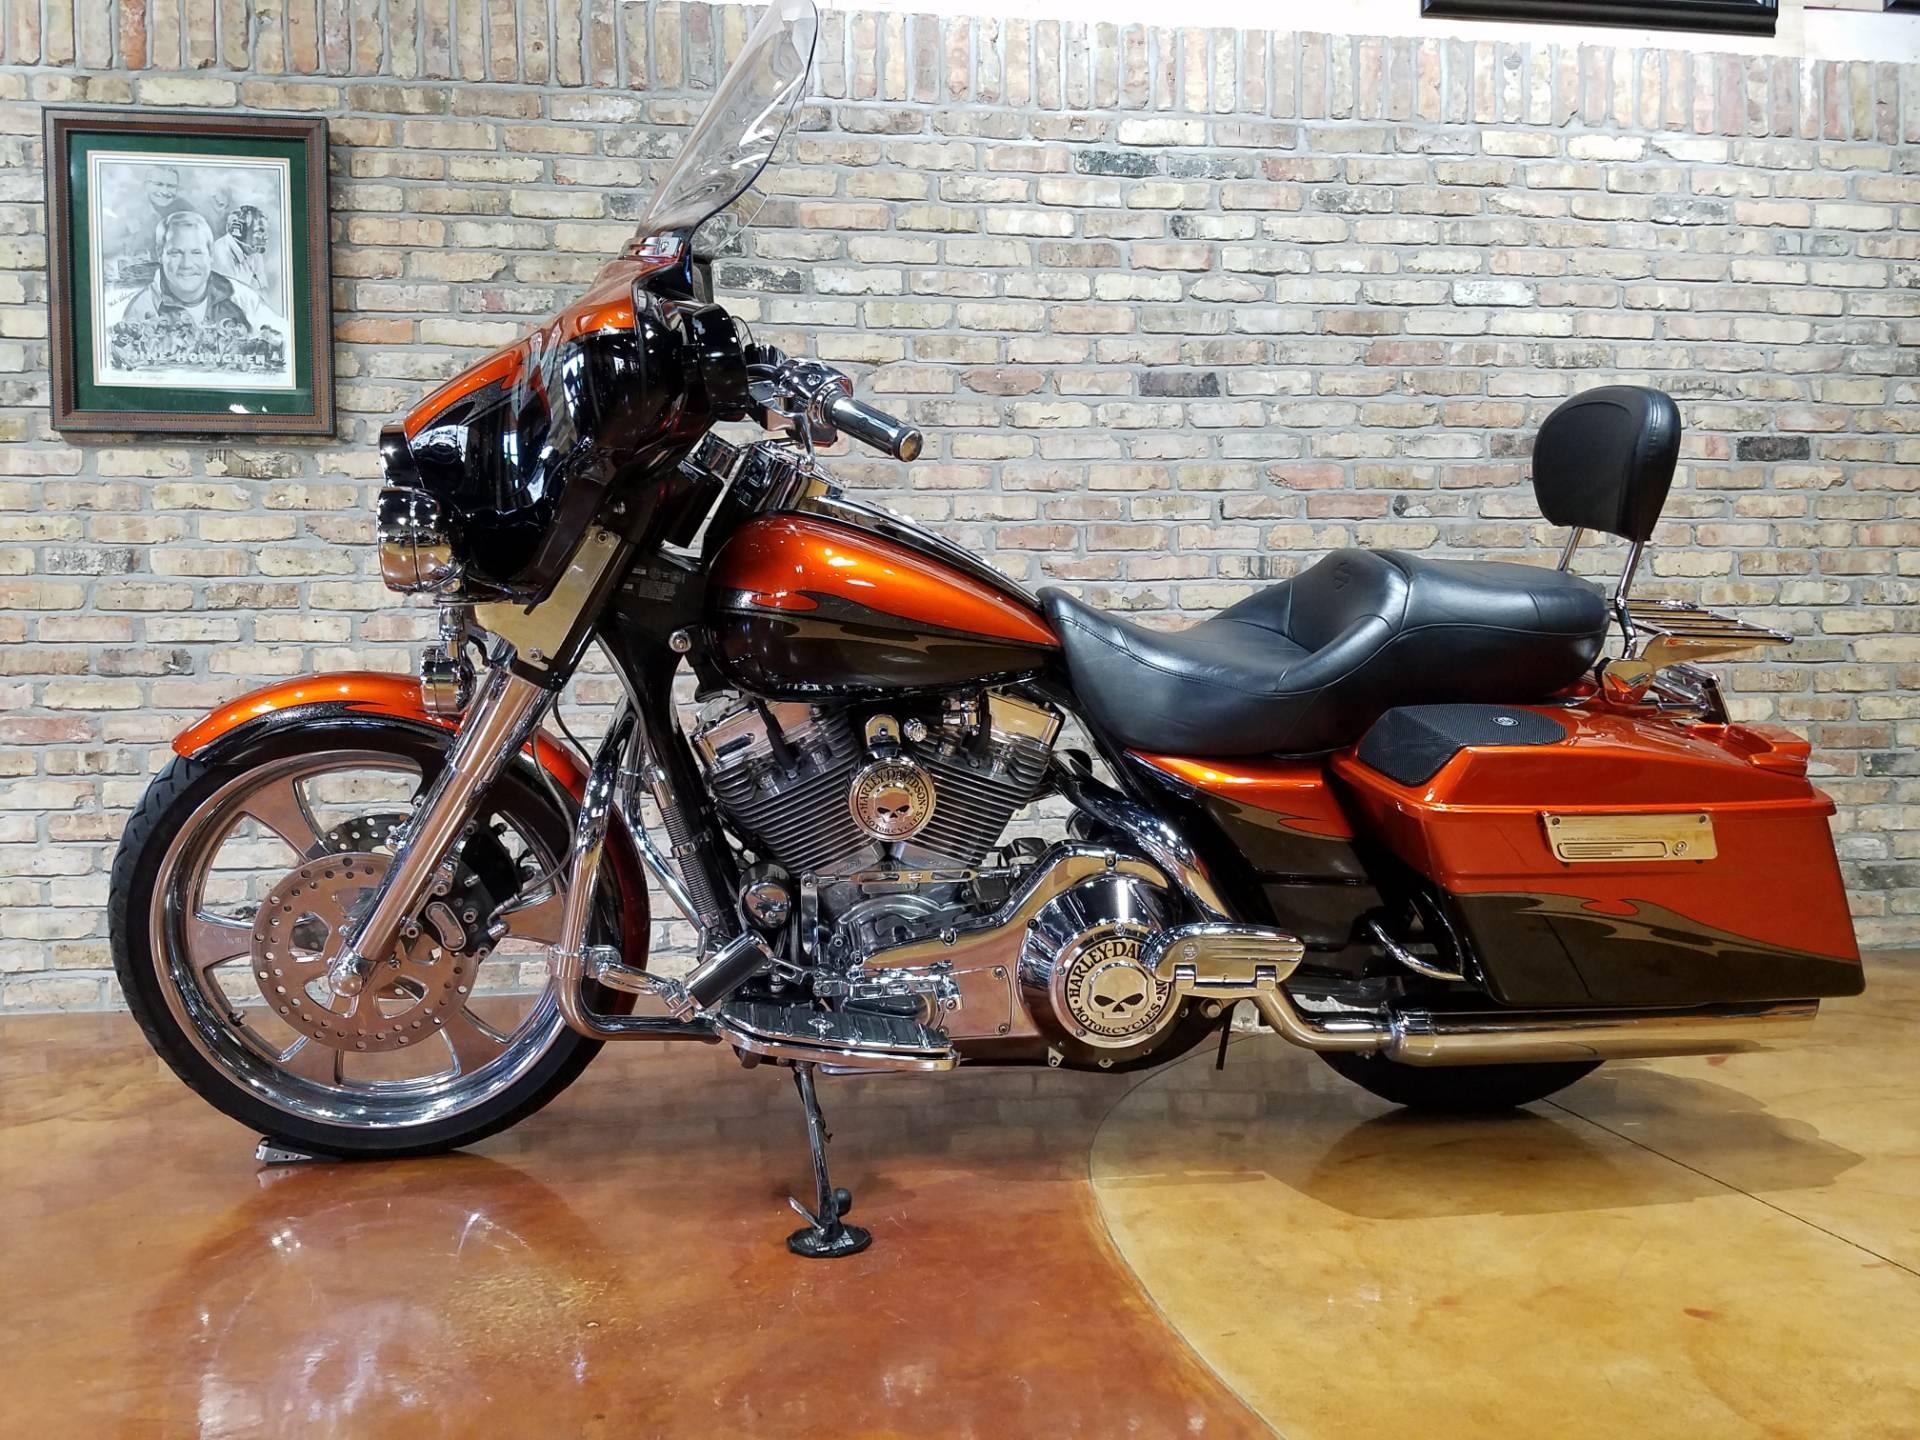 Used 2005 Harley Davidson FLHT/FLHTI Electra Glide ...